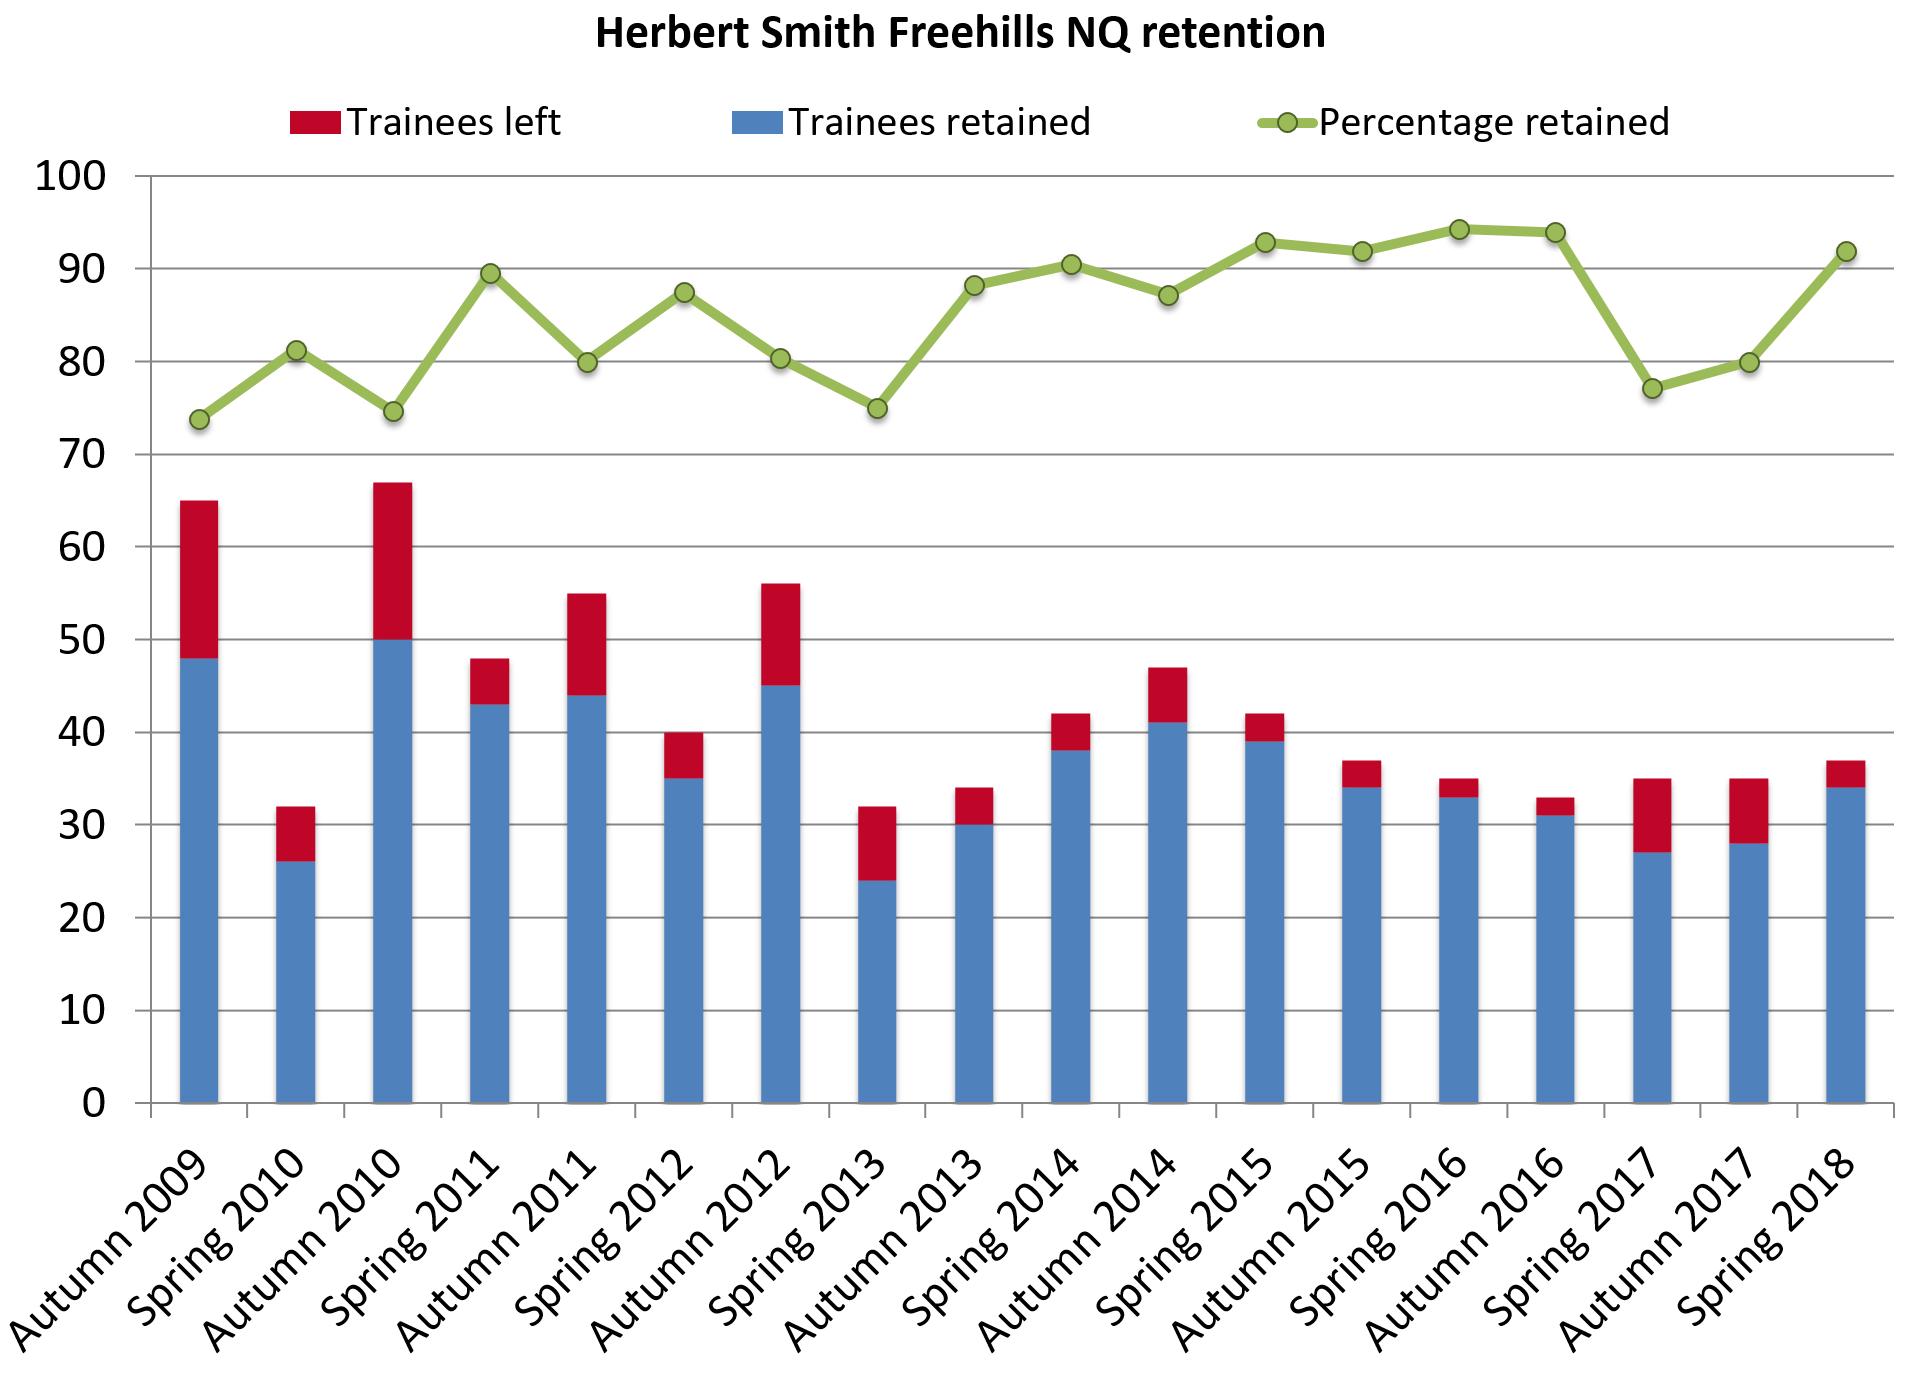 Herbert Smith Freehills retention 2018